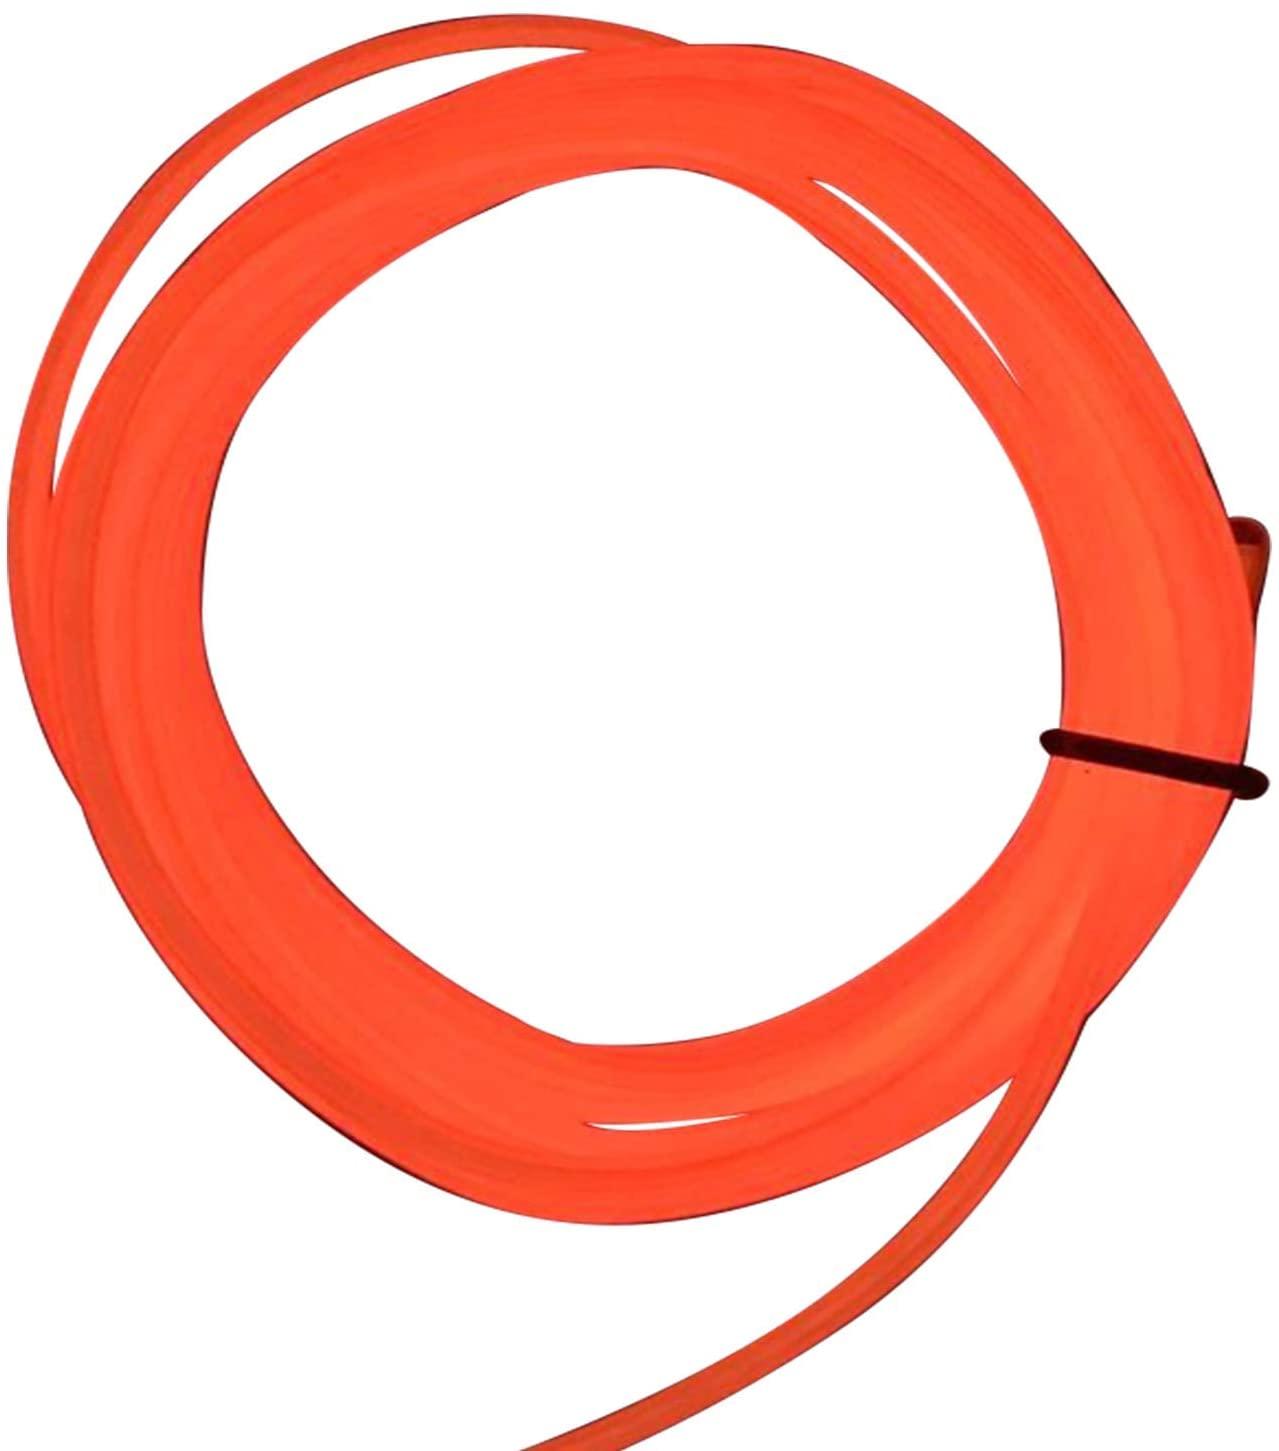 M.best 15FT Neon Light El Wire Orange Battery Powered